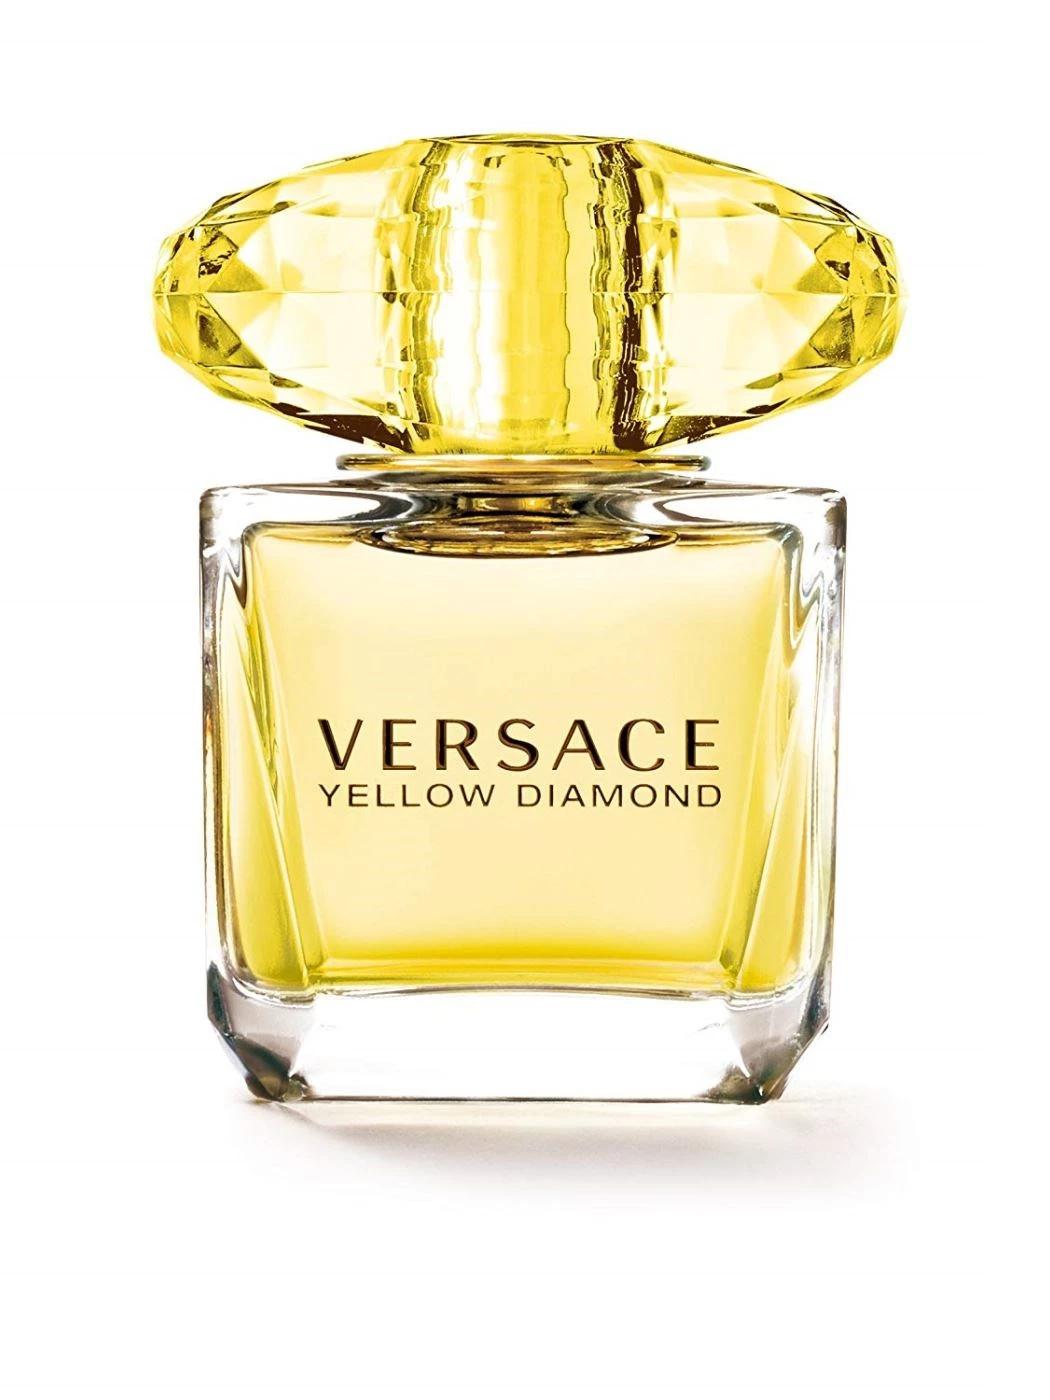 YELLOW DIAMOND VERSACE  EAU DE PARFUME 30ML